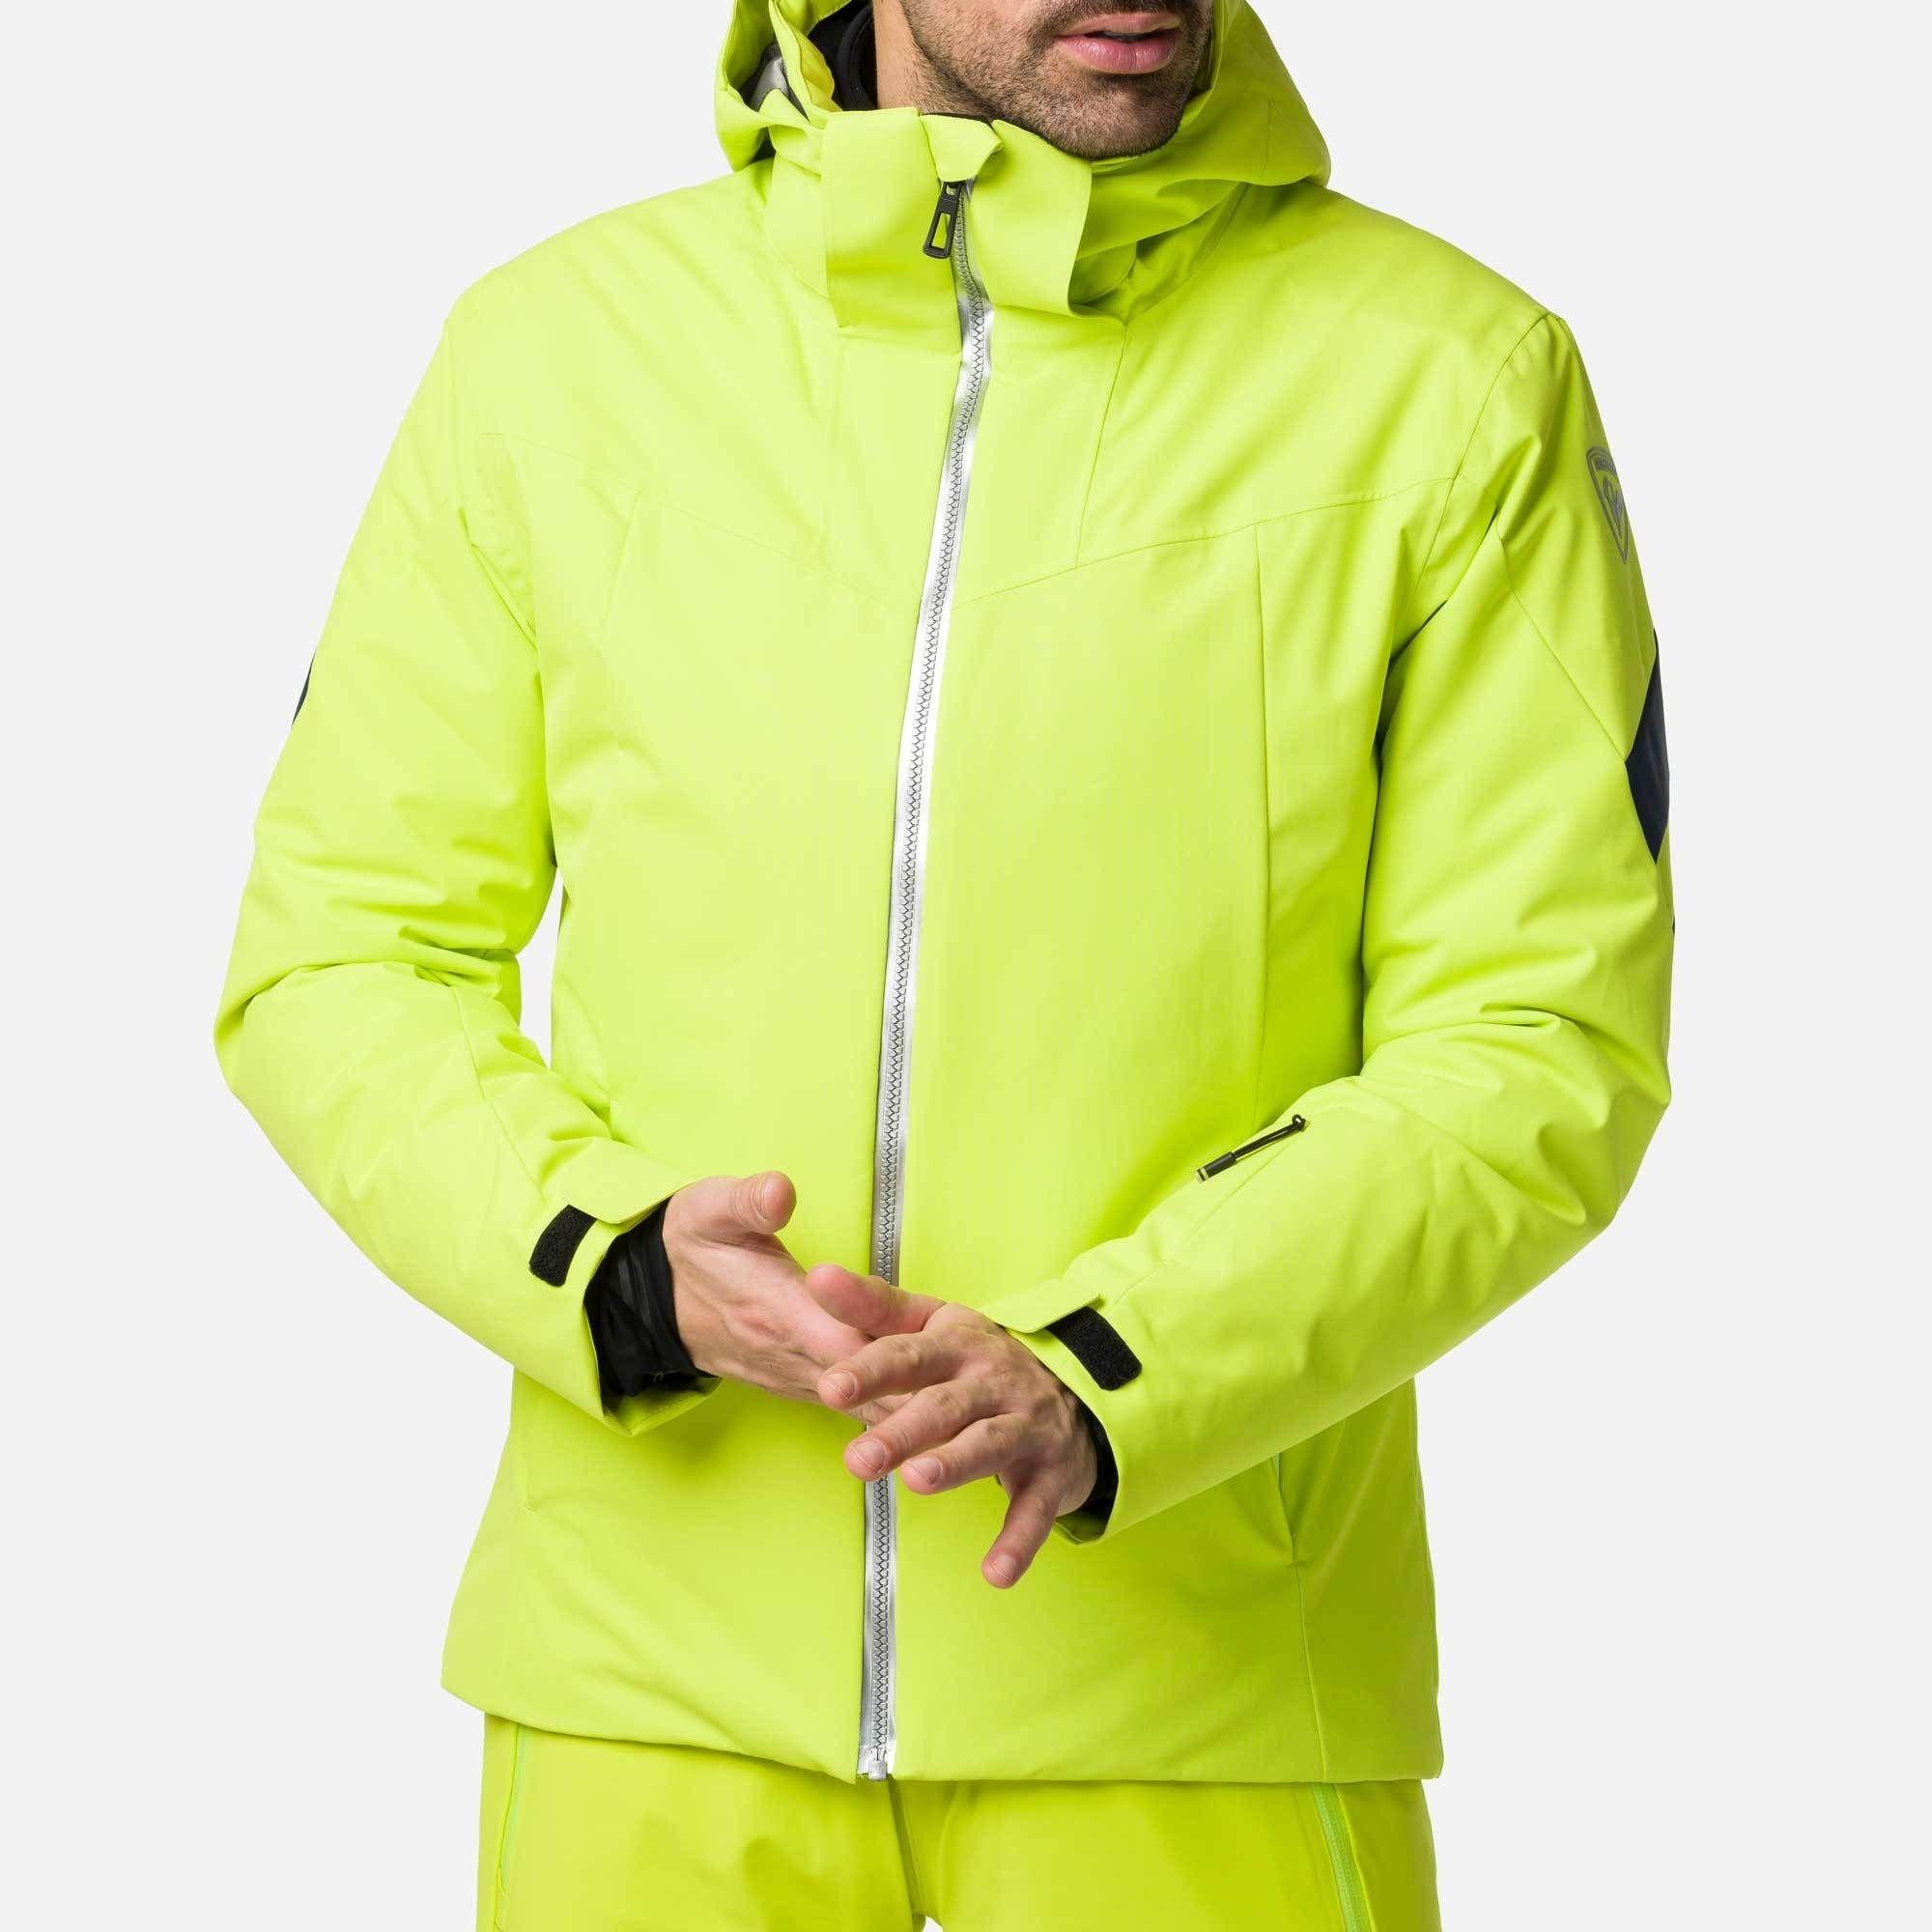 ROSSIGNOL CANADA Controle Jacket, Clover